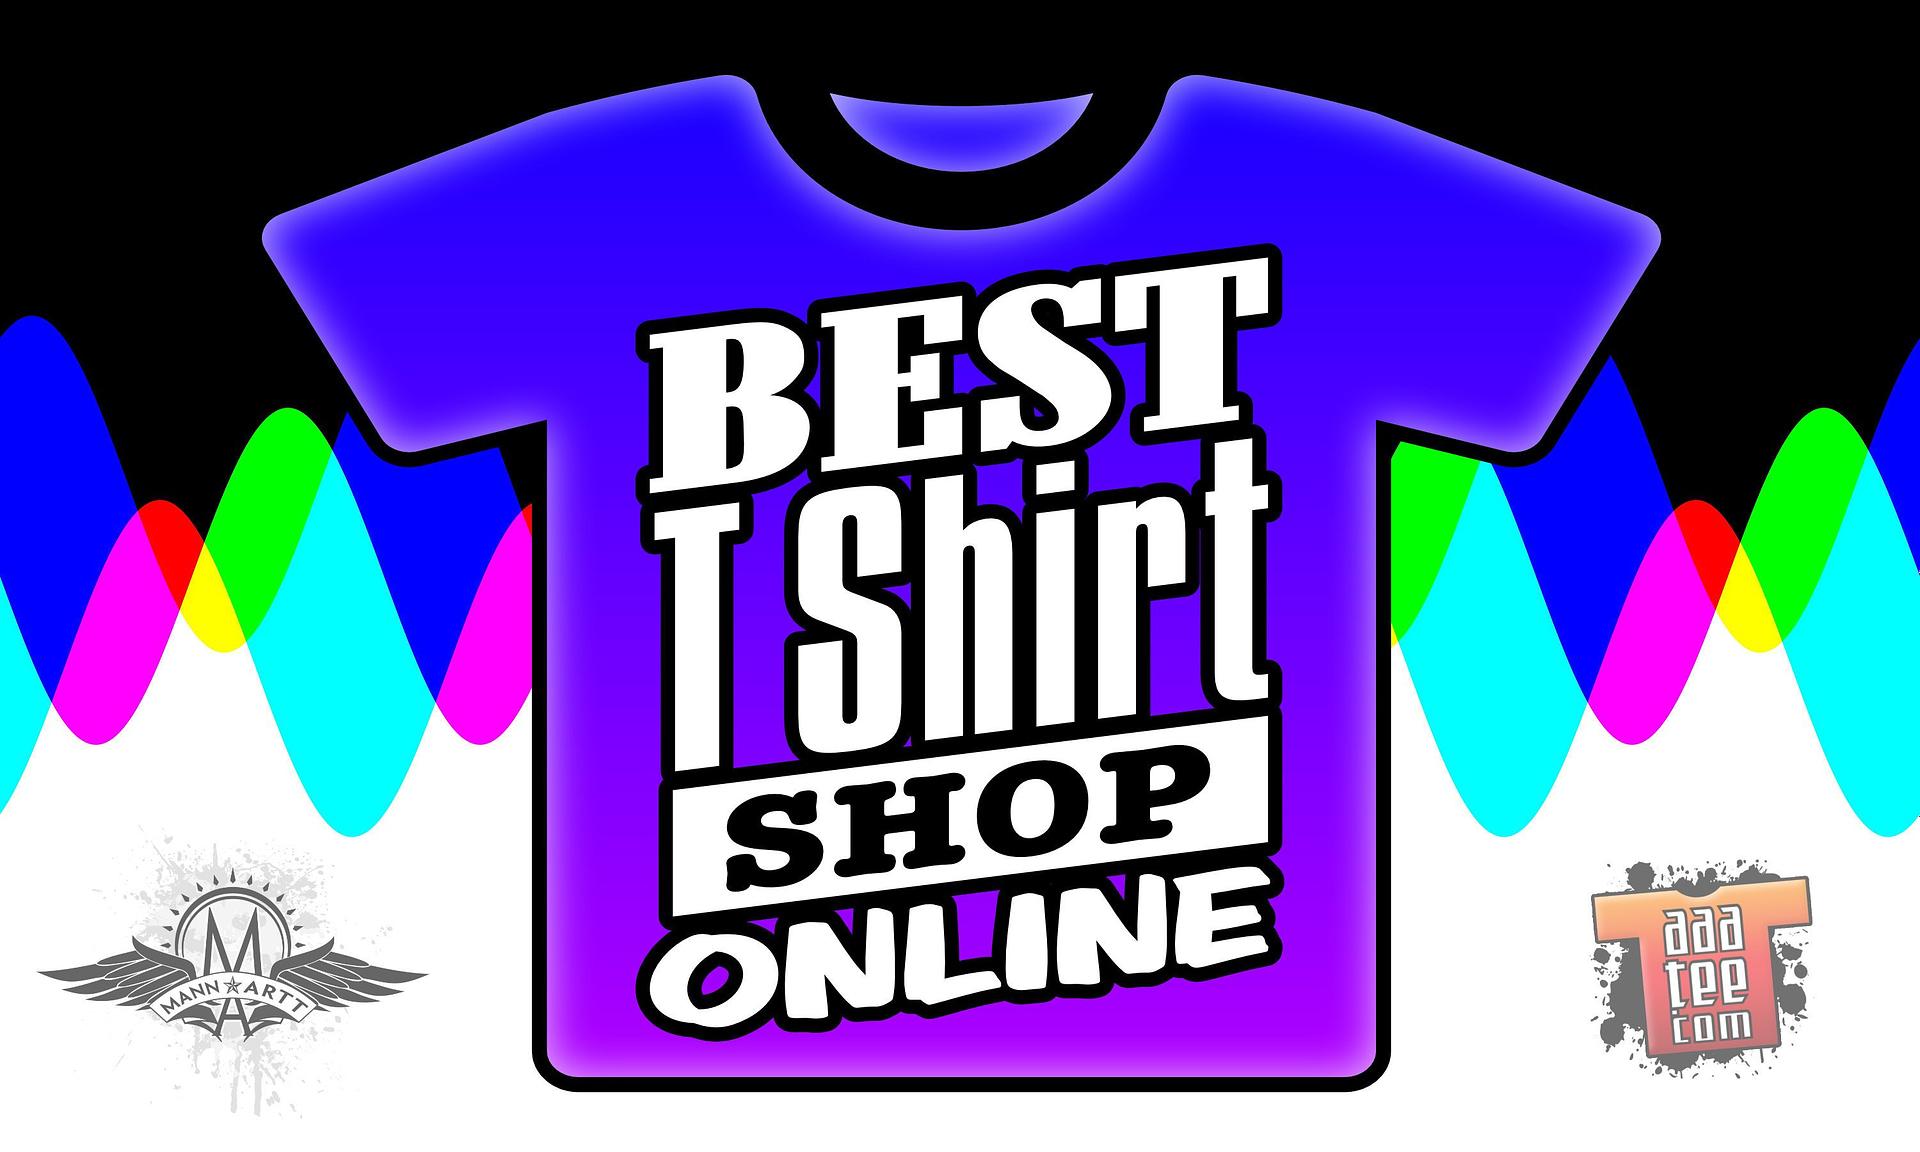 Is AAATEE.COM the Best T Shirt Shop Online?